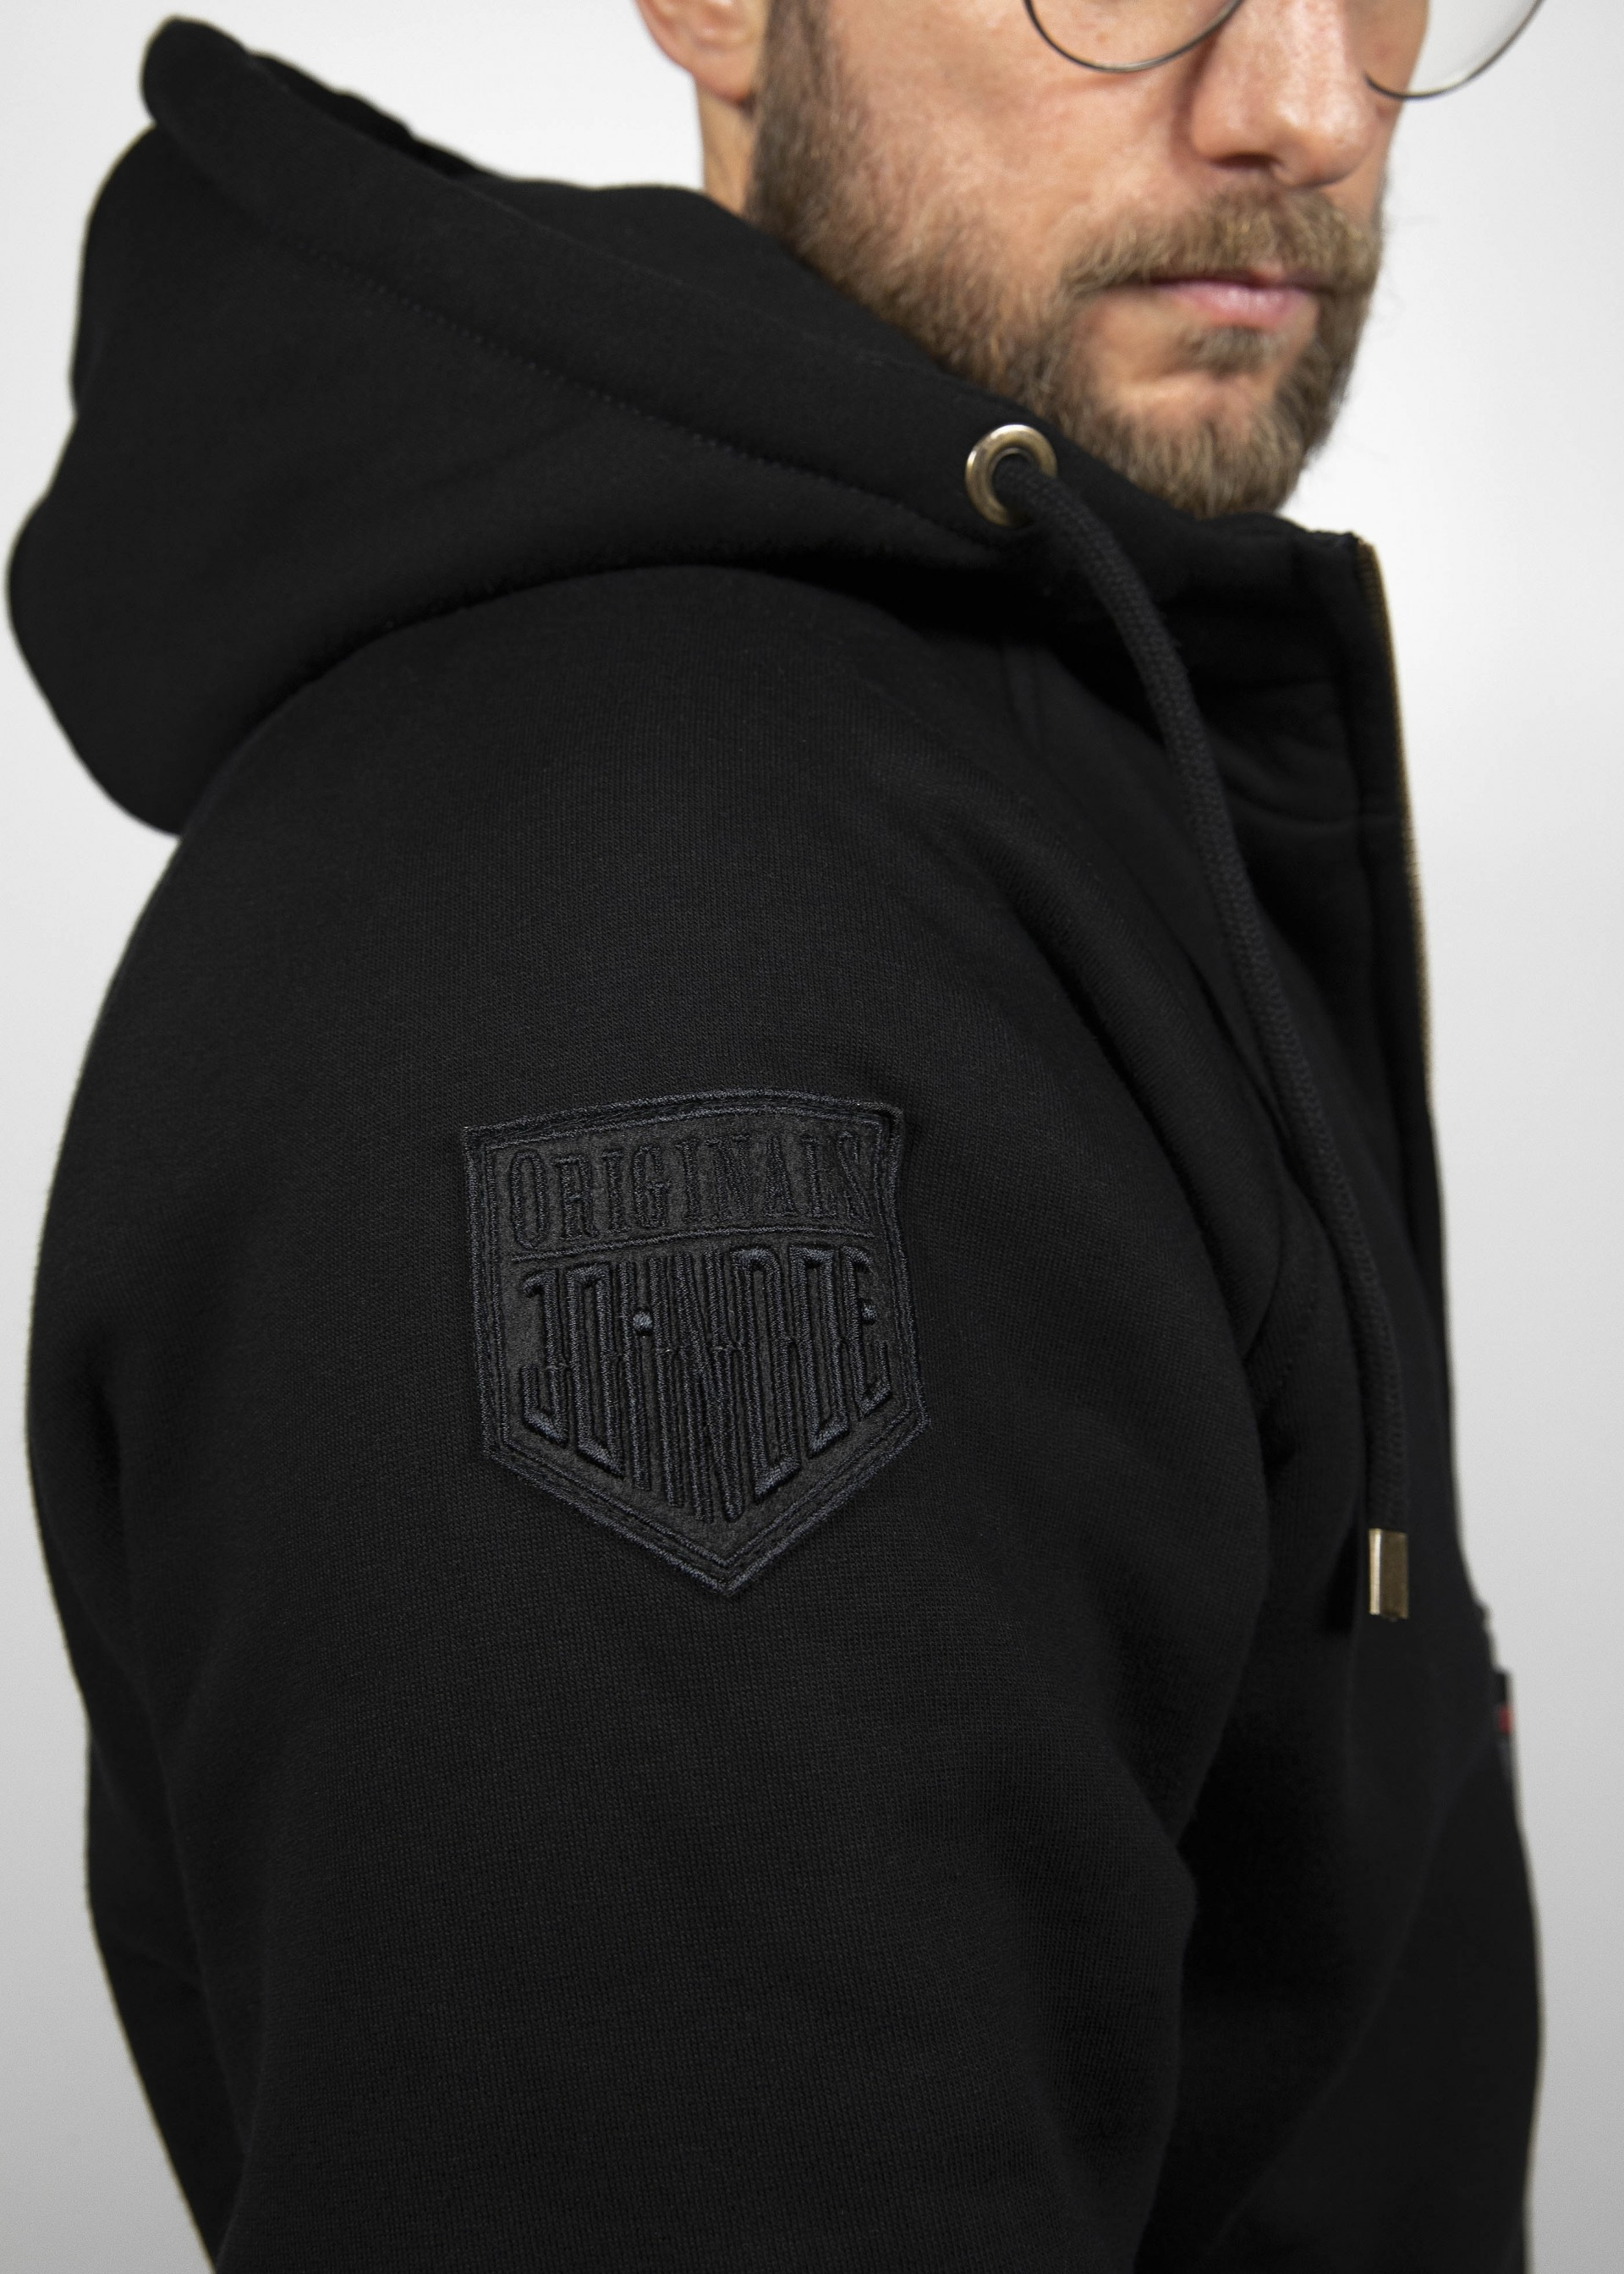 Details about  /John Doe Hoodie With XTM Aramid Fibre Black